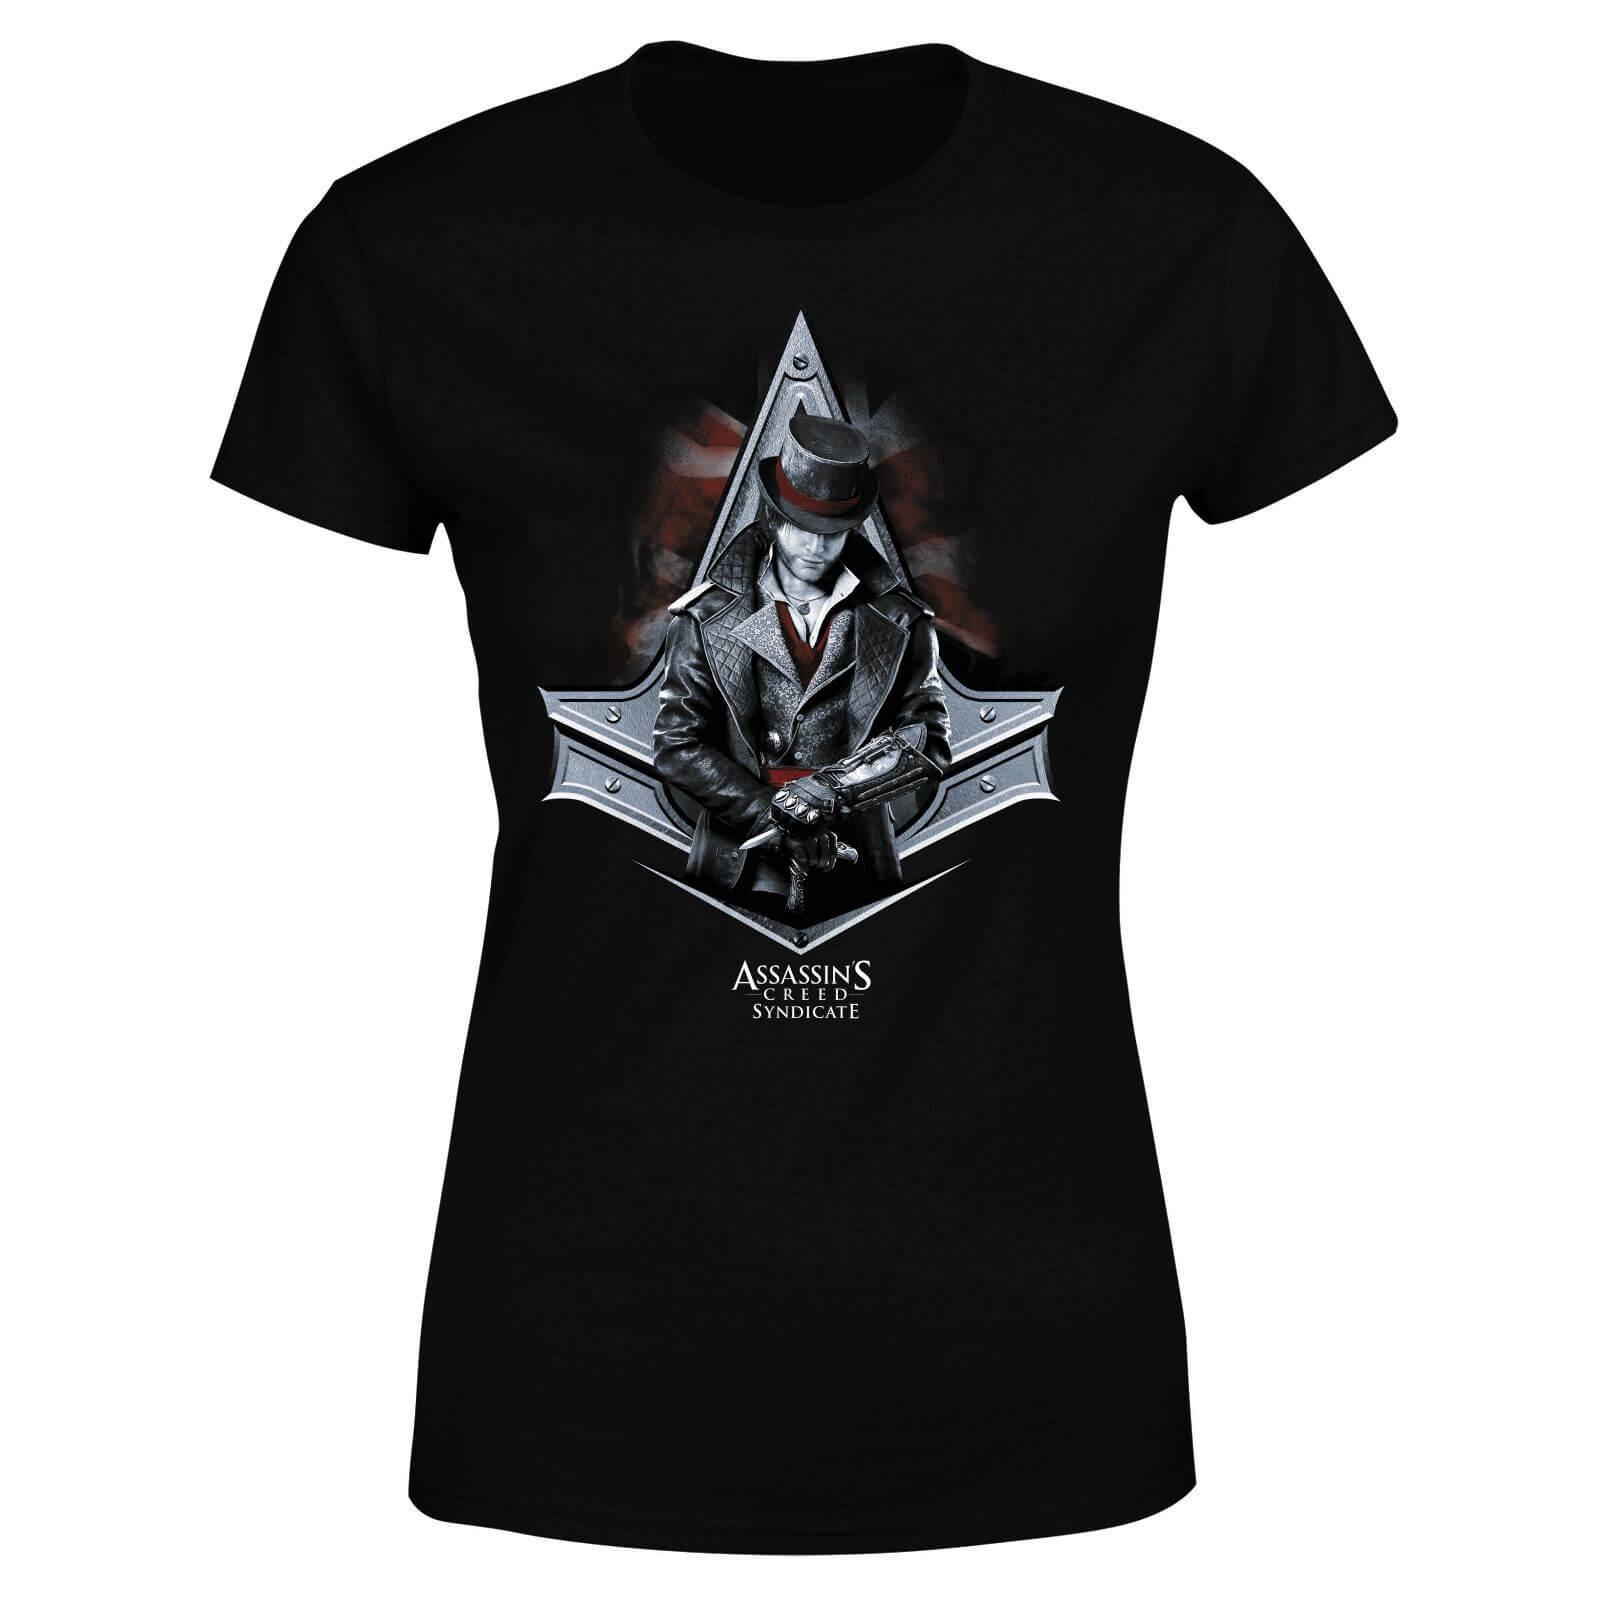 Assassin's Creed T-Shirt Femme Jacob Assassin's Creed Syndicate - Noir - L - Noir